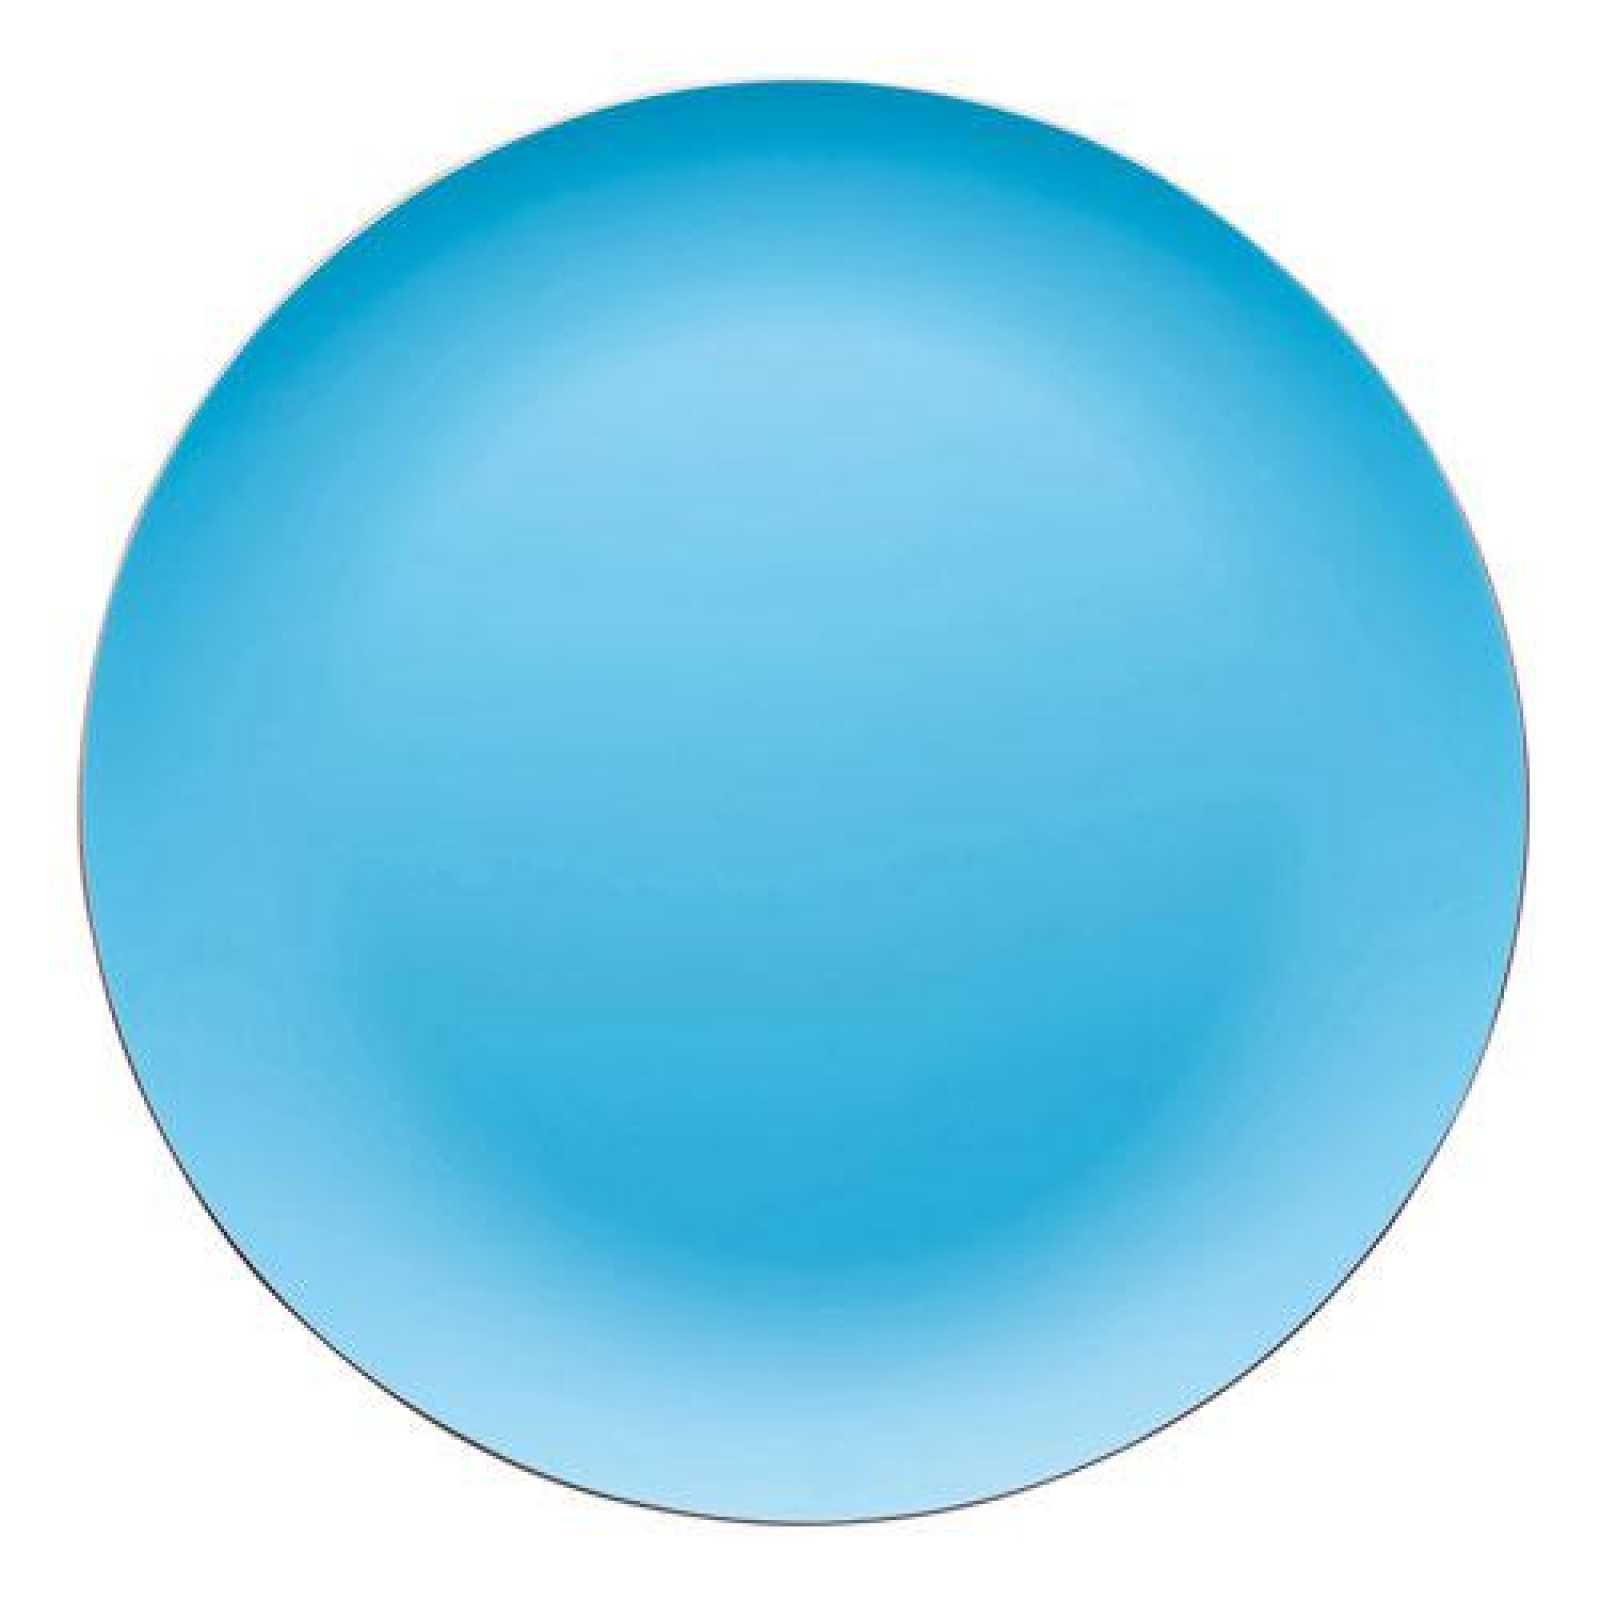 Онлайн каталог PROMENU: Поднос деревянный Rosenthal SUNNY DAY, диаметр 41 см, голубой Rosenthal 69763-408530-05642